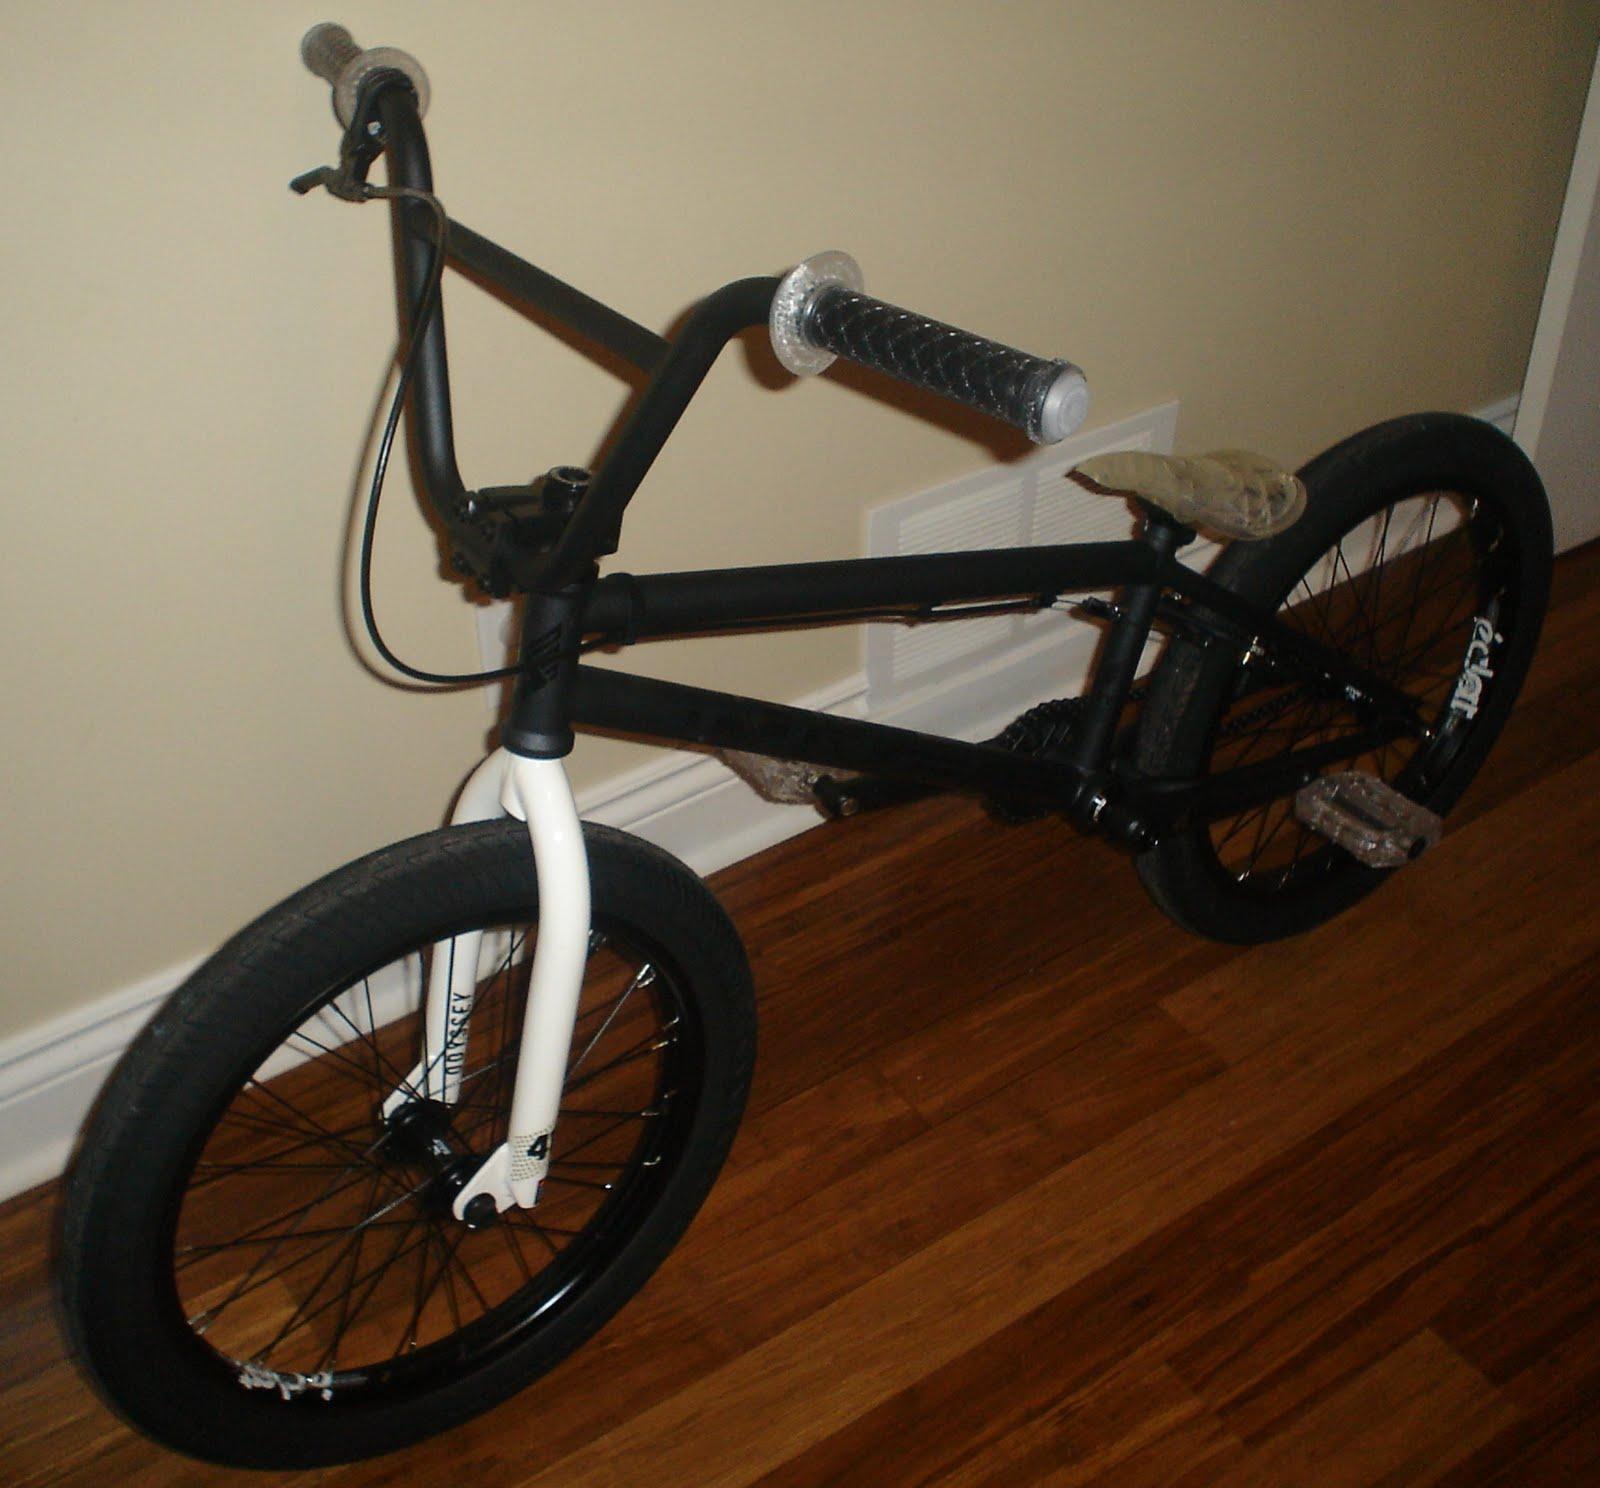 gebrauchtes wethepeople auf vordermann bringen fahrrad. Black Bedroom Furniture Sets. Home Design Ideas